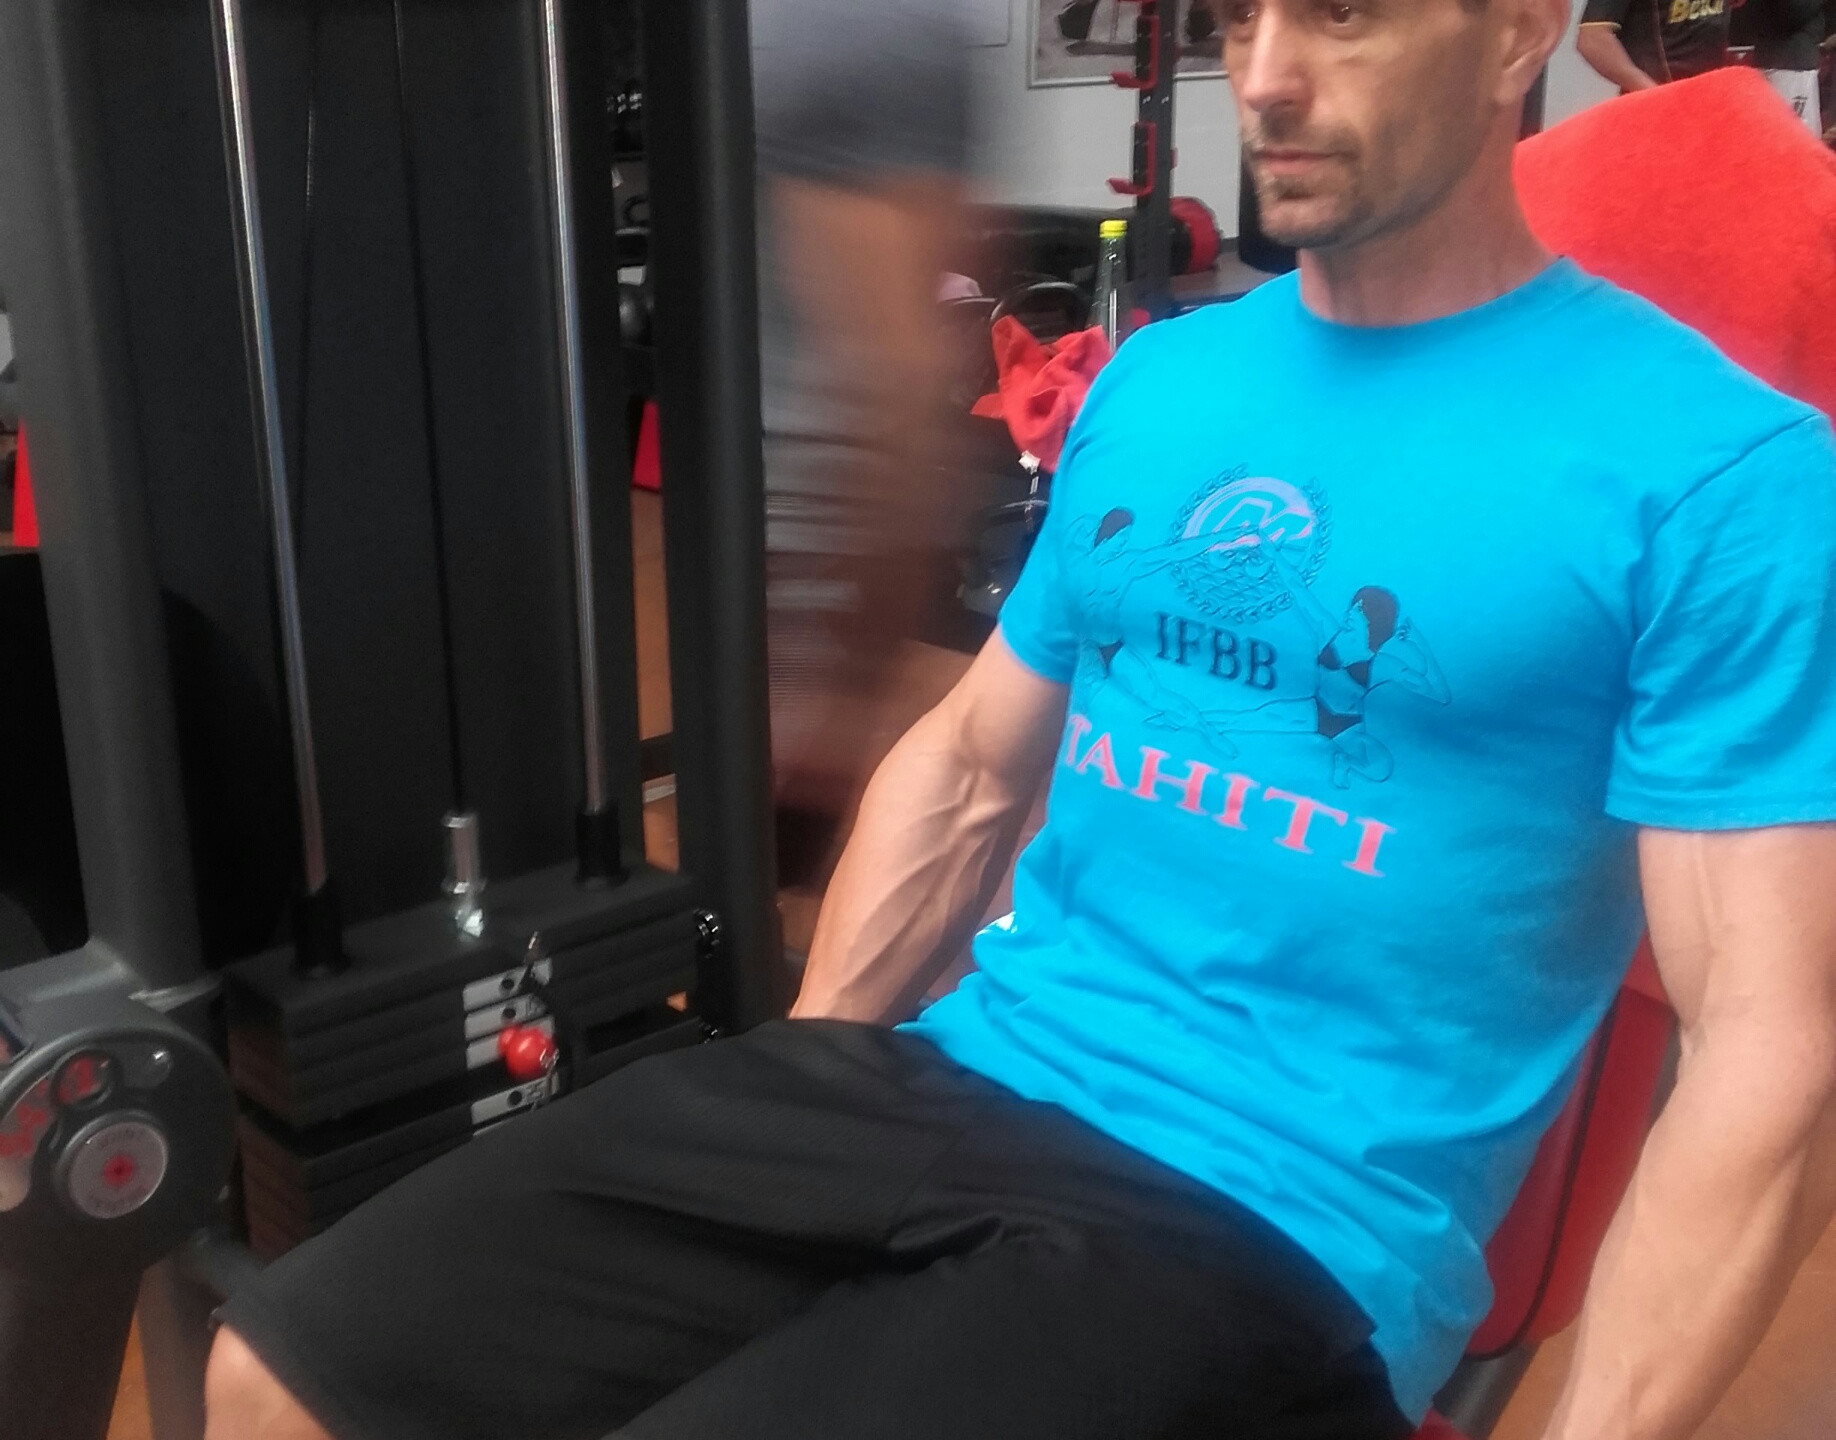 Vincent Carreau iIFBB Tahiti Athlète Classic Bodybuilding